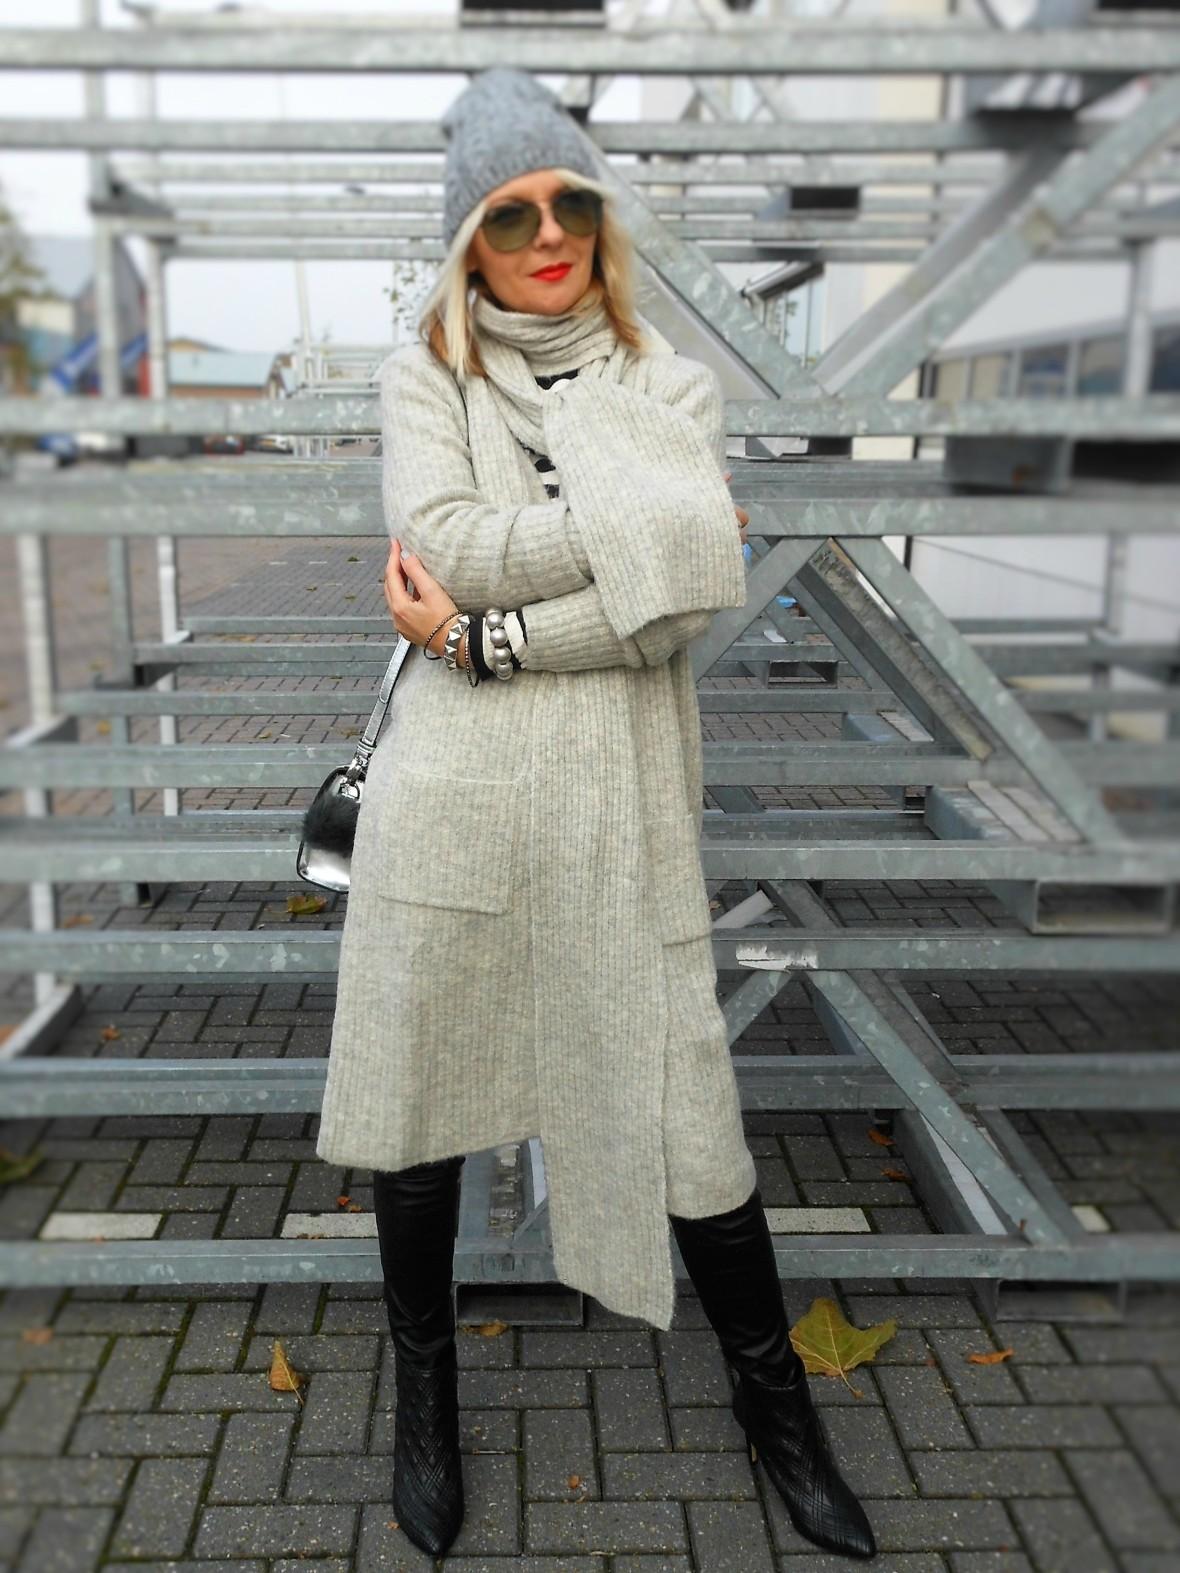 winter knit blogger, winter knits blogger, chunky knit blogger, how to wear chunky knits blogger